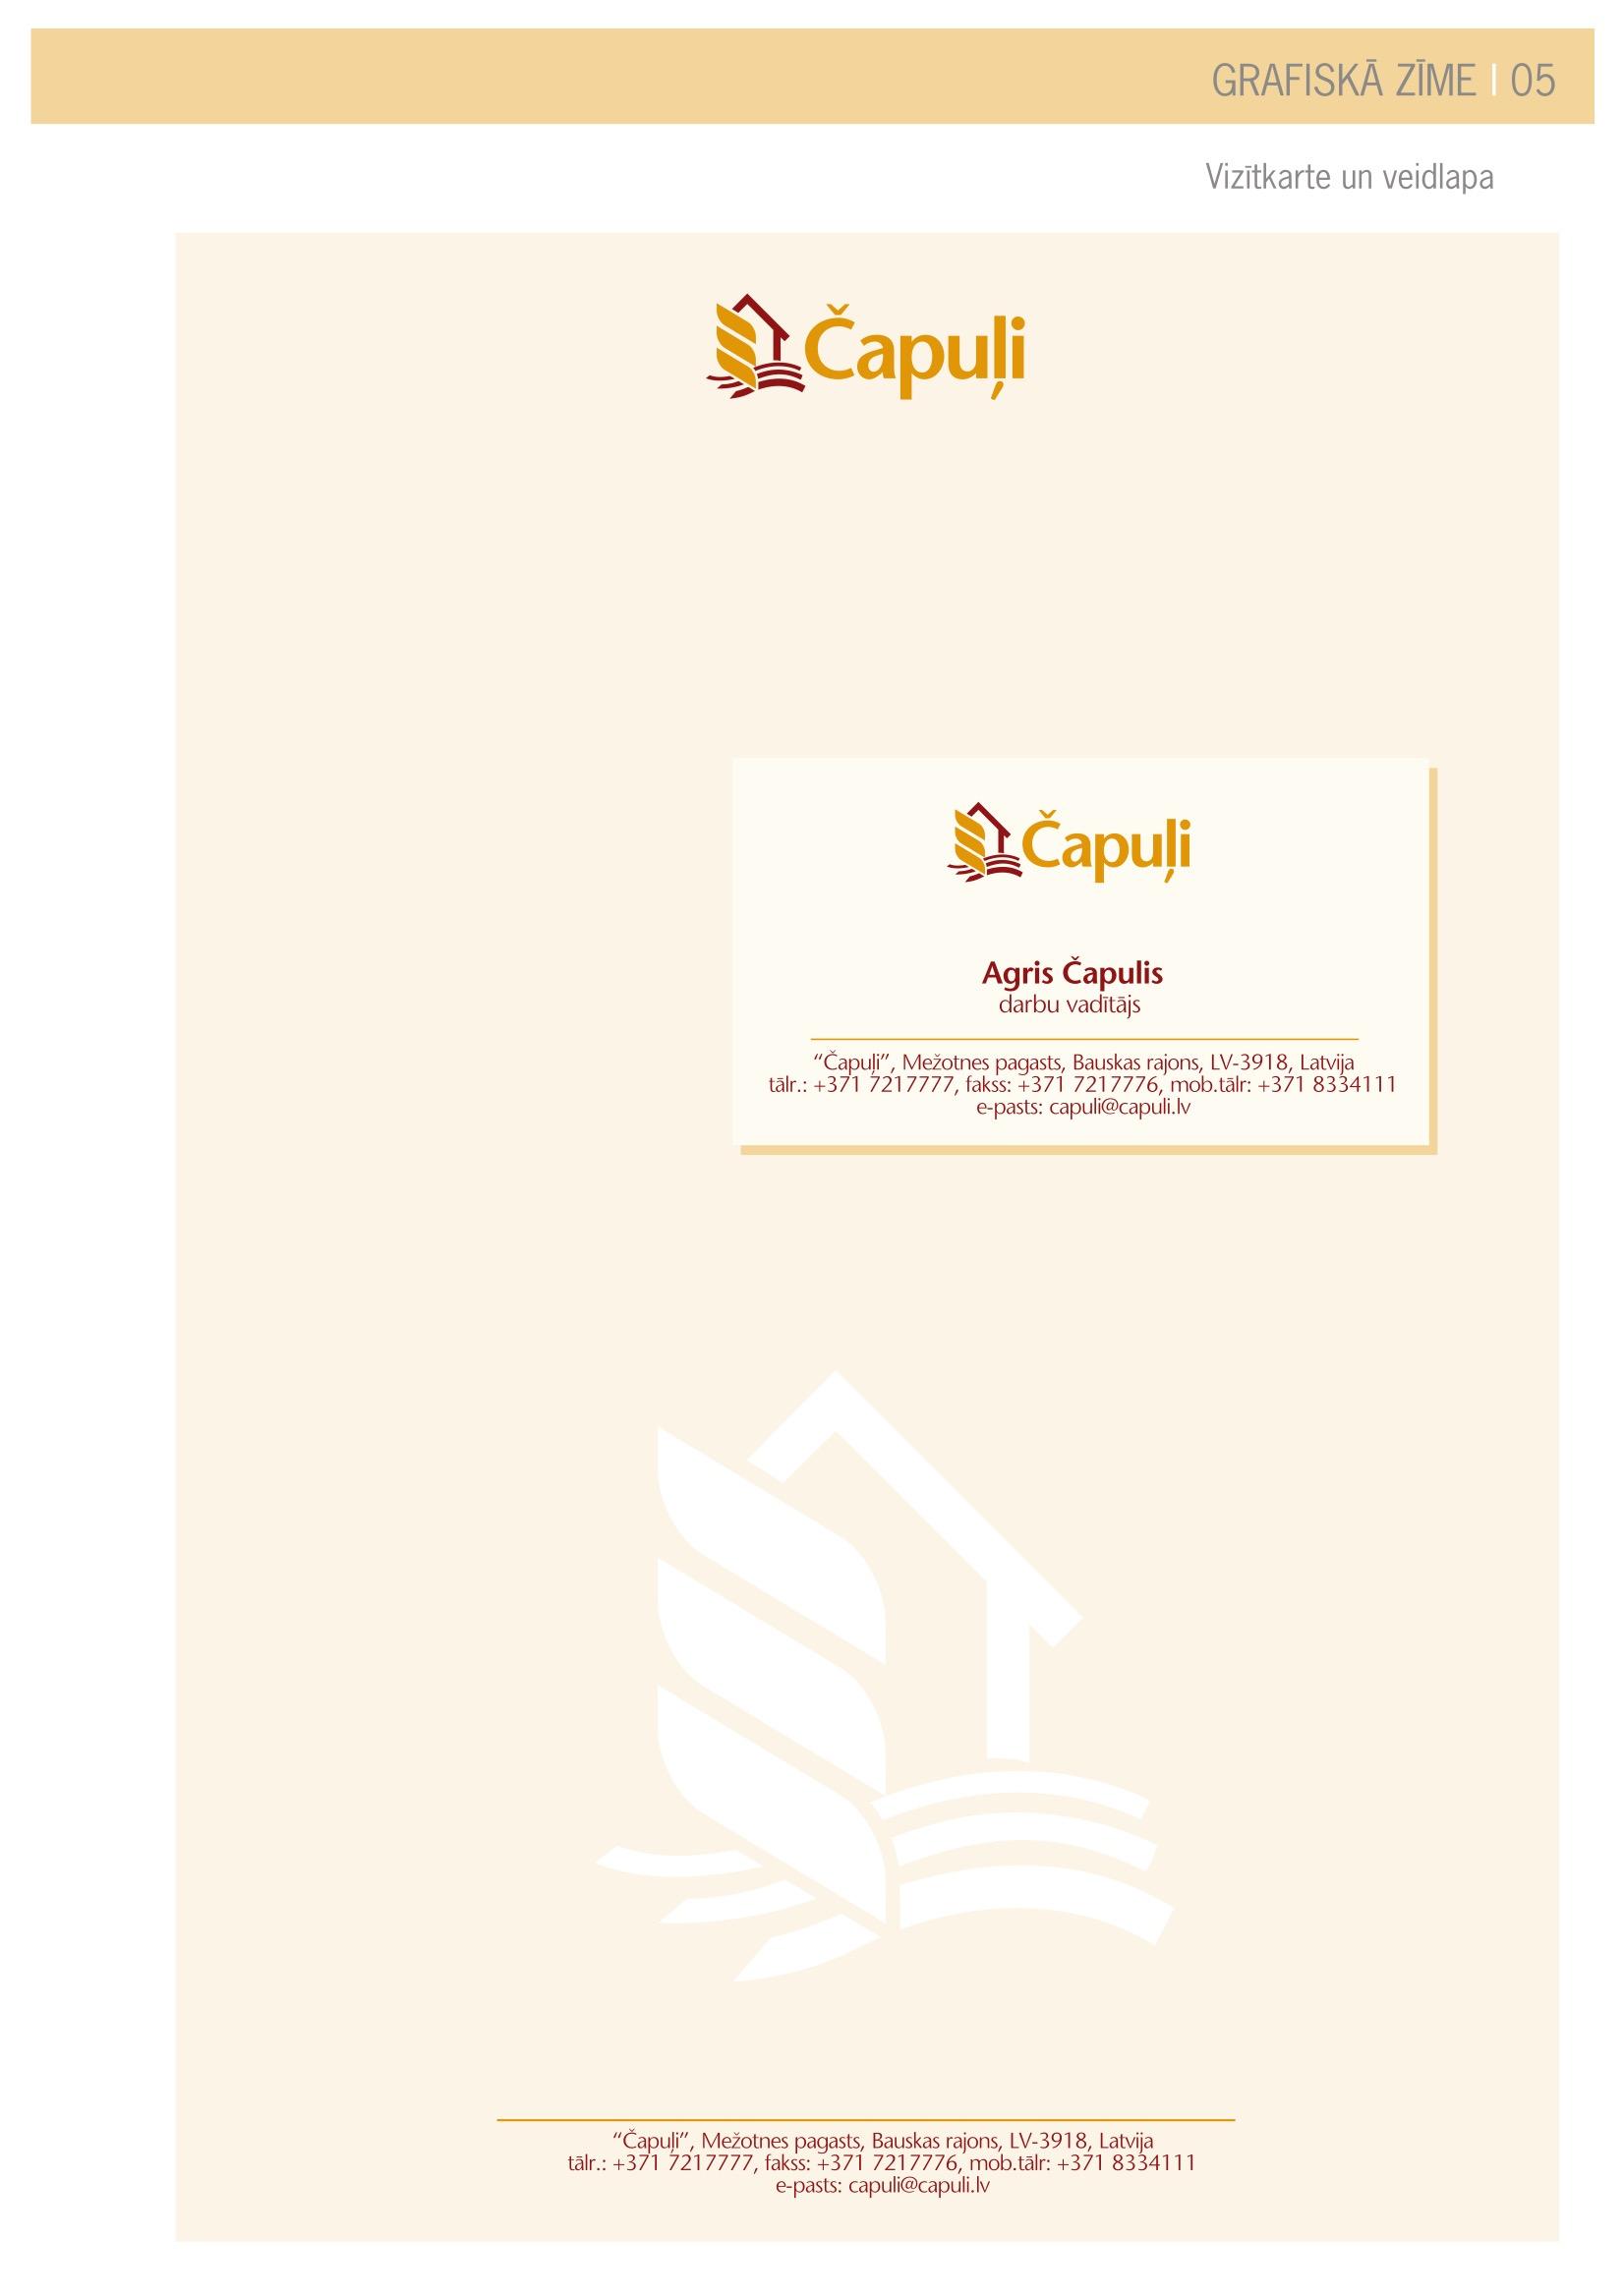 Chapulji_Stils 5